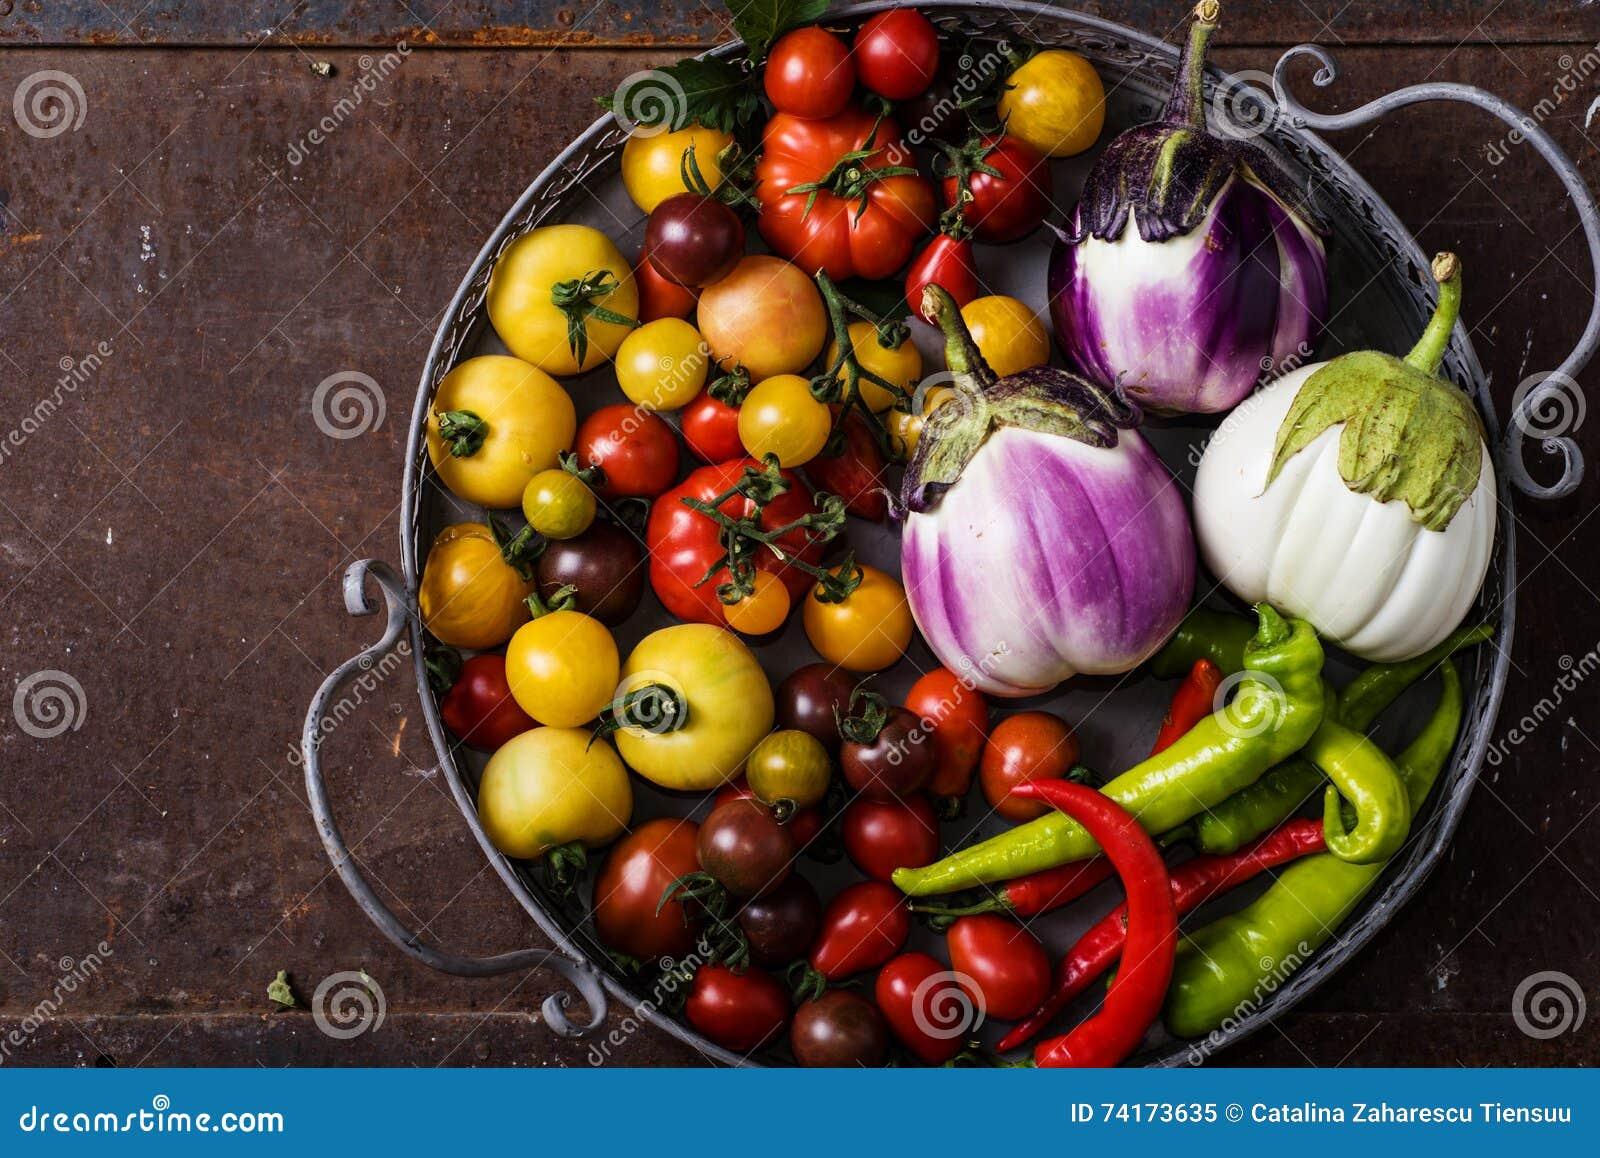 Closeup of metallic basket with fresh vegetables